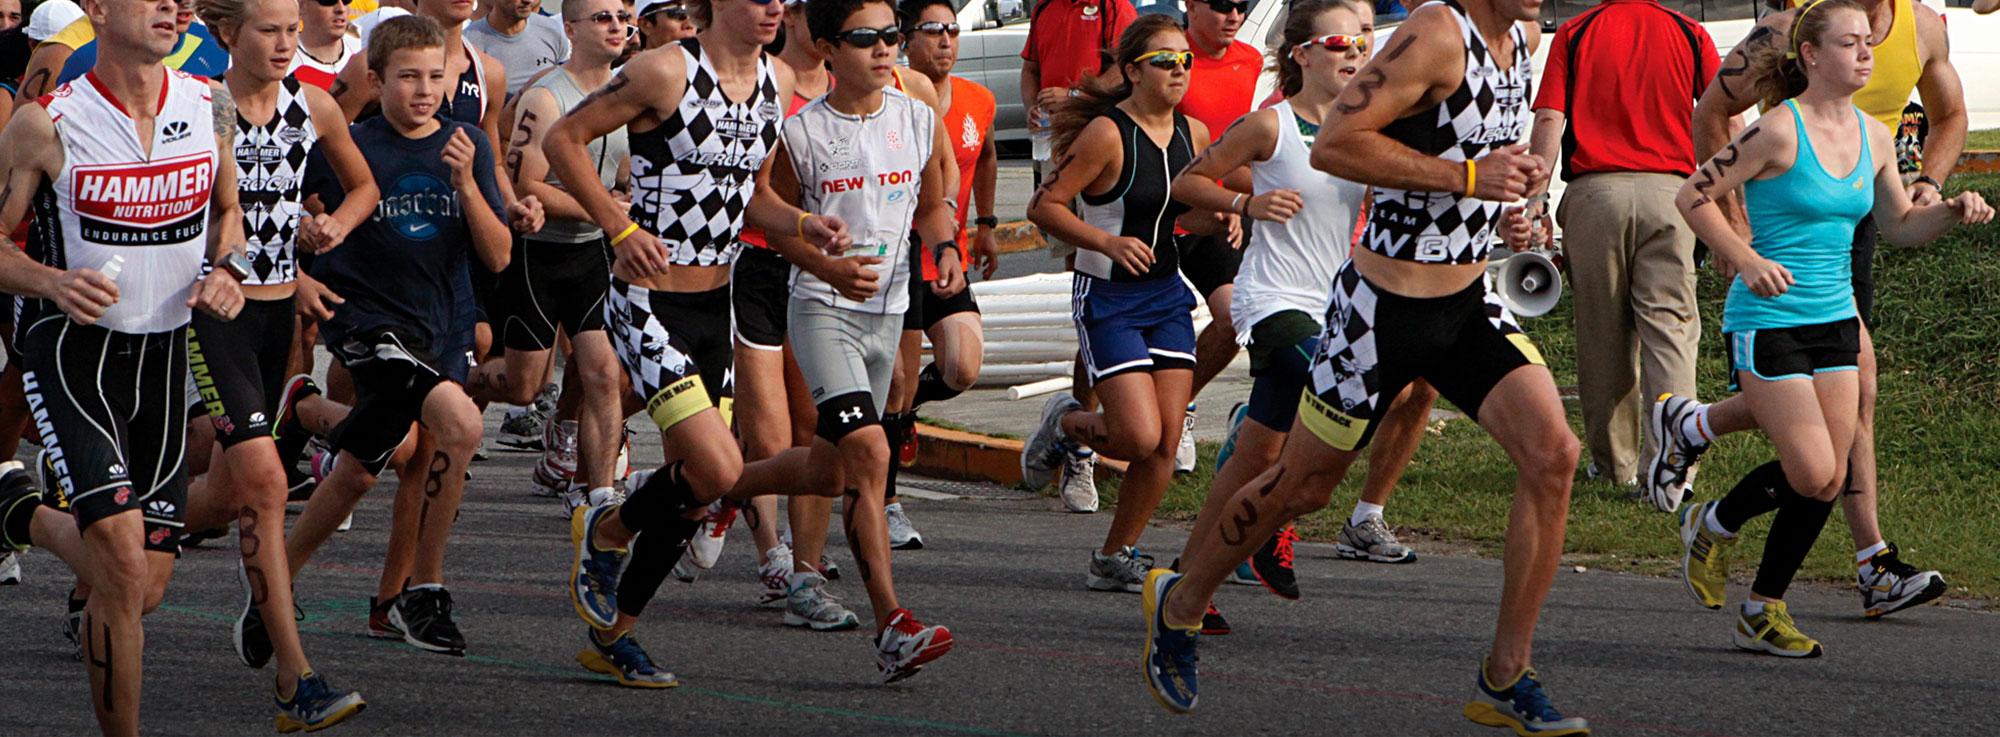 Trani: Triathlon Trani – Tommaso Assi 2018 – Sprint